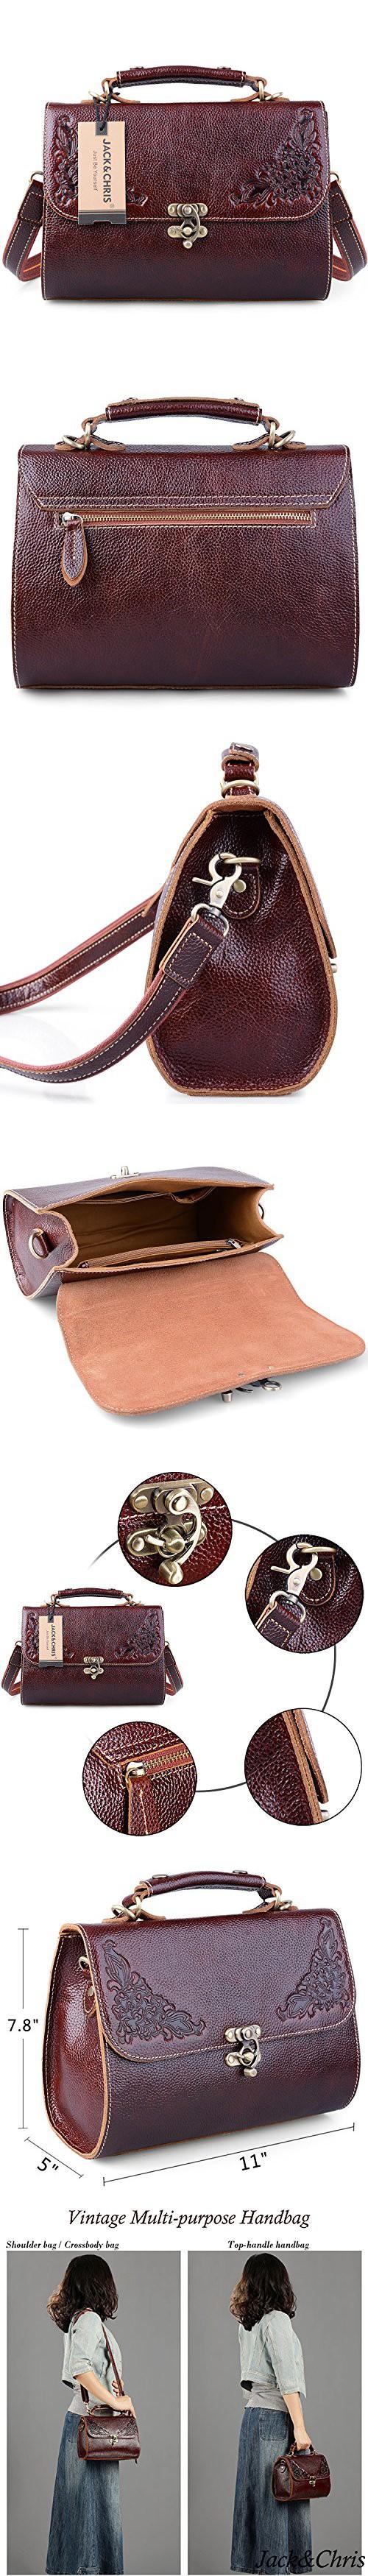 a4ac099823ea Jack Chris Small Vintage Satchel Leather Handbags Floral Purse Top Handle  Crossbody Bag for Women